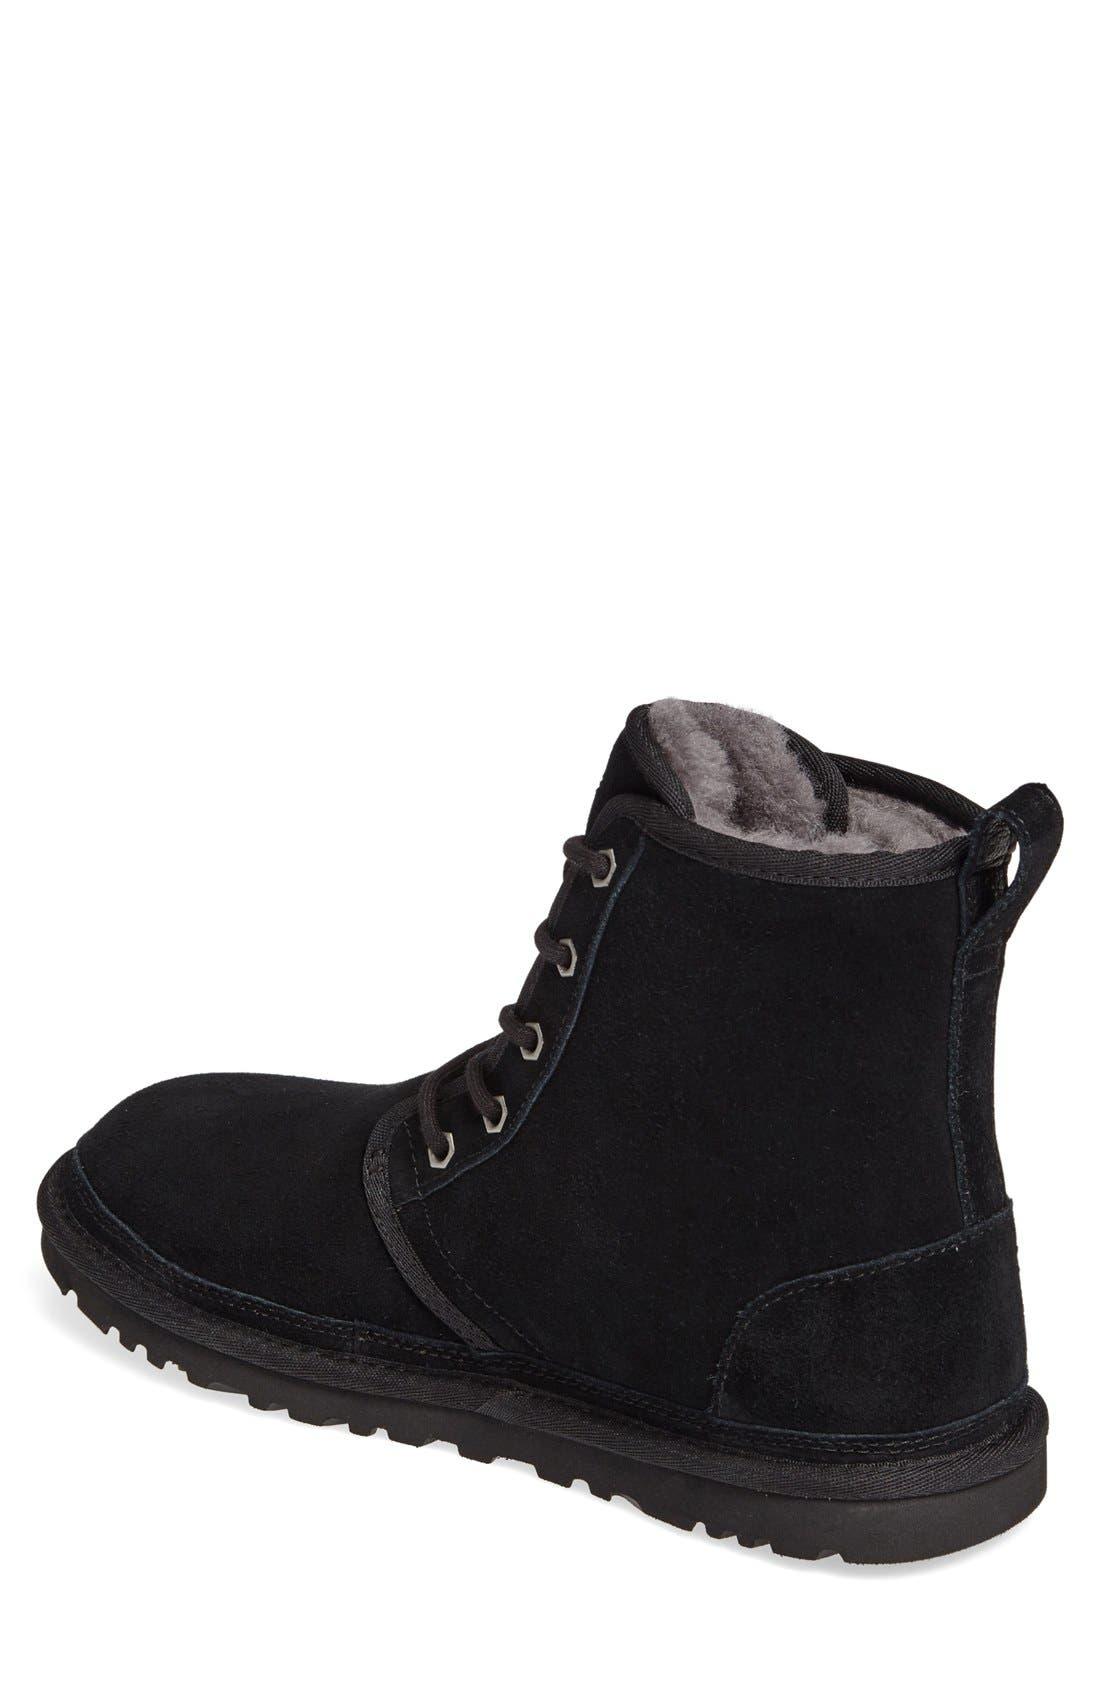 Alternate Image 2  - UGG® Harkley Lace-Up Boot (Men)